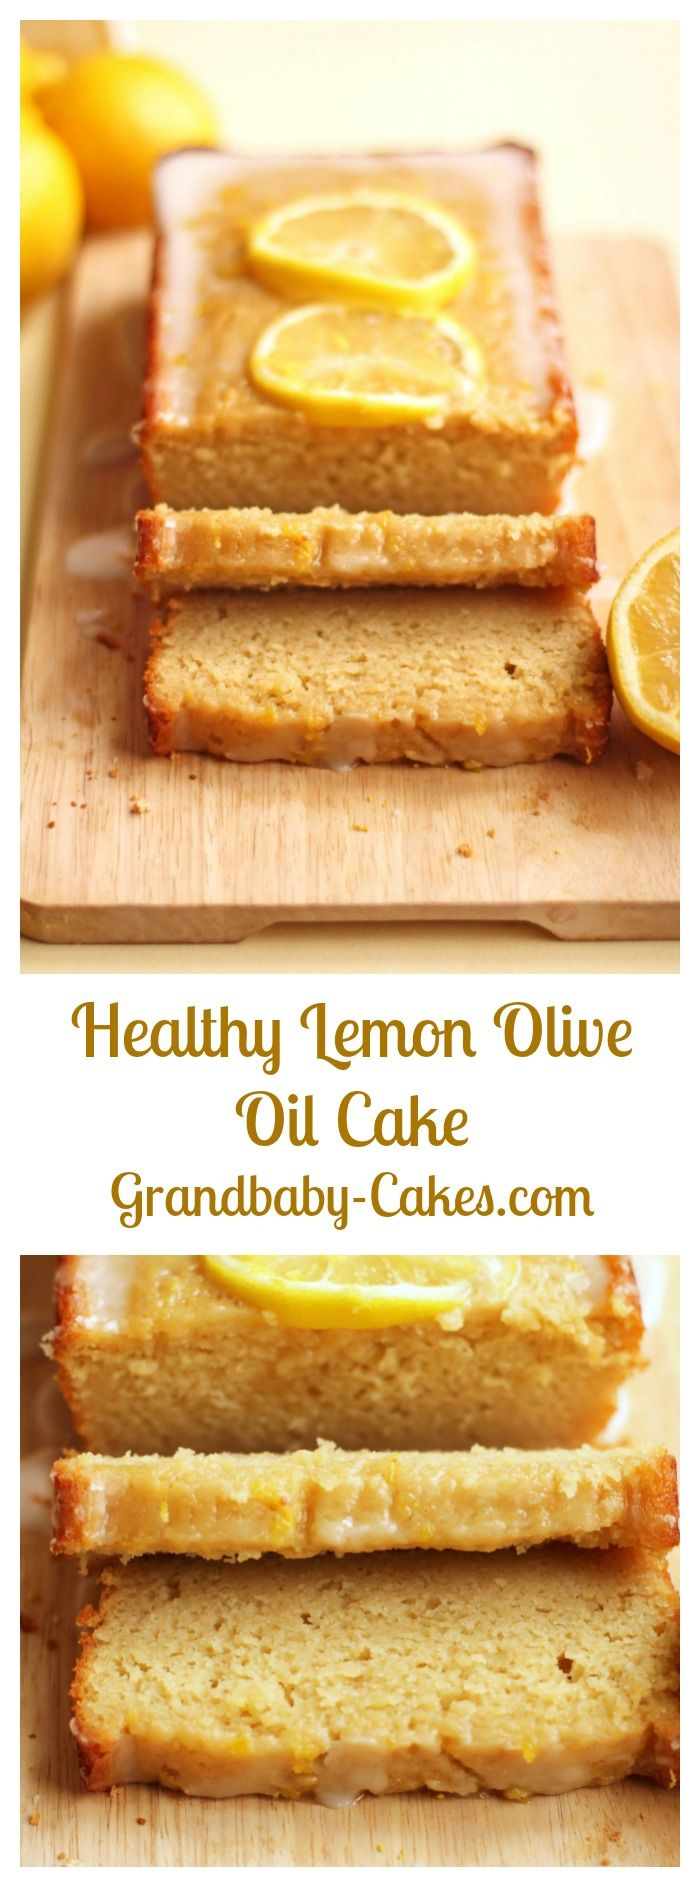 Healthy Lemon Olive Oil Cake | Grandbaby-Cakes.com #oliveoils